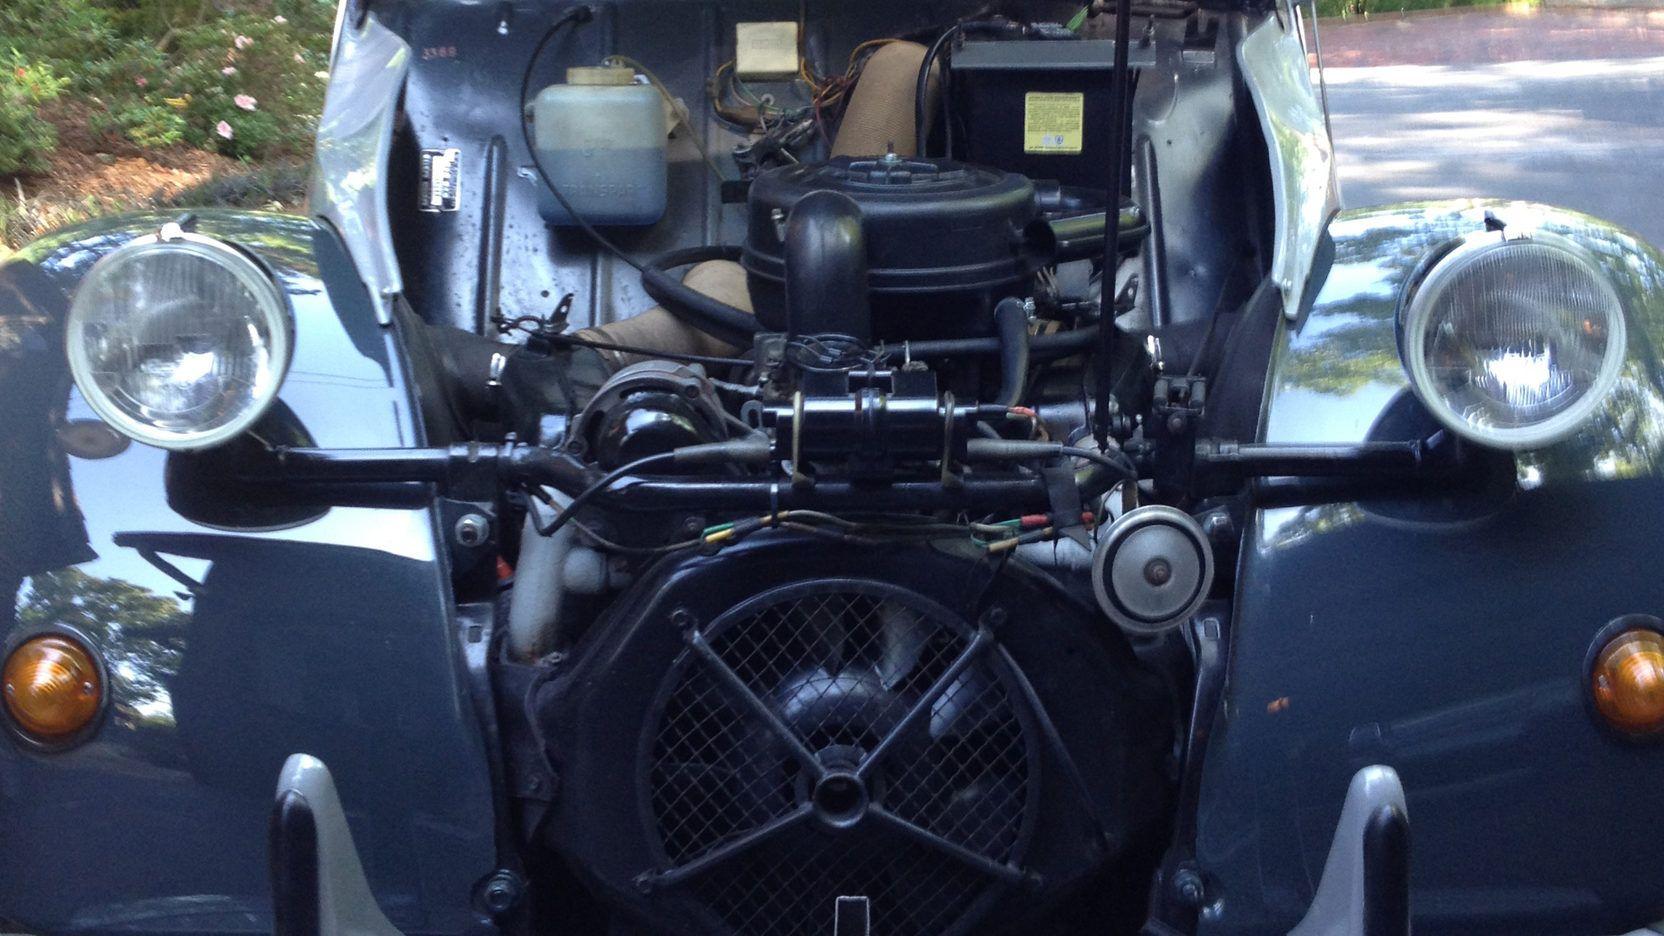 1981 Citroen 2 Cv Charleston Convertible W58 Kissimmee 2015 Kissimmee Mecum Auction Auction Sites